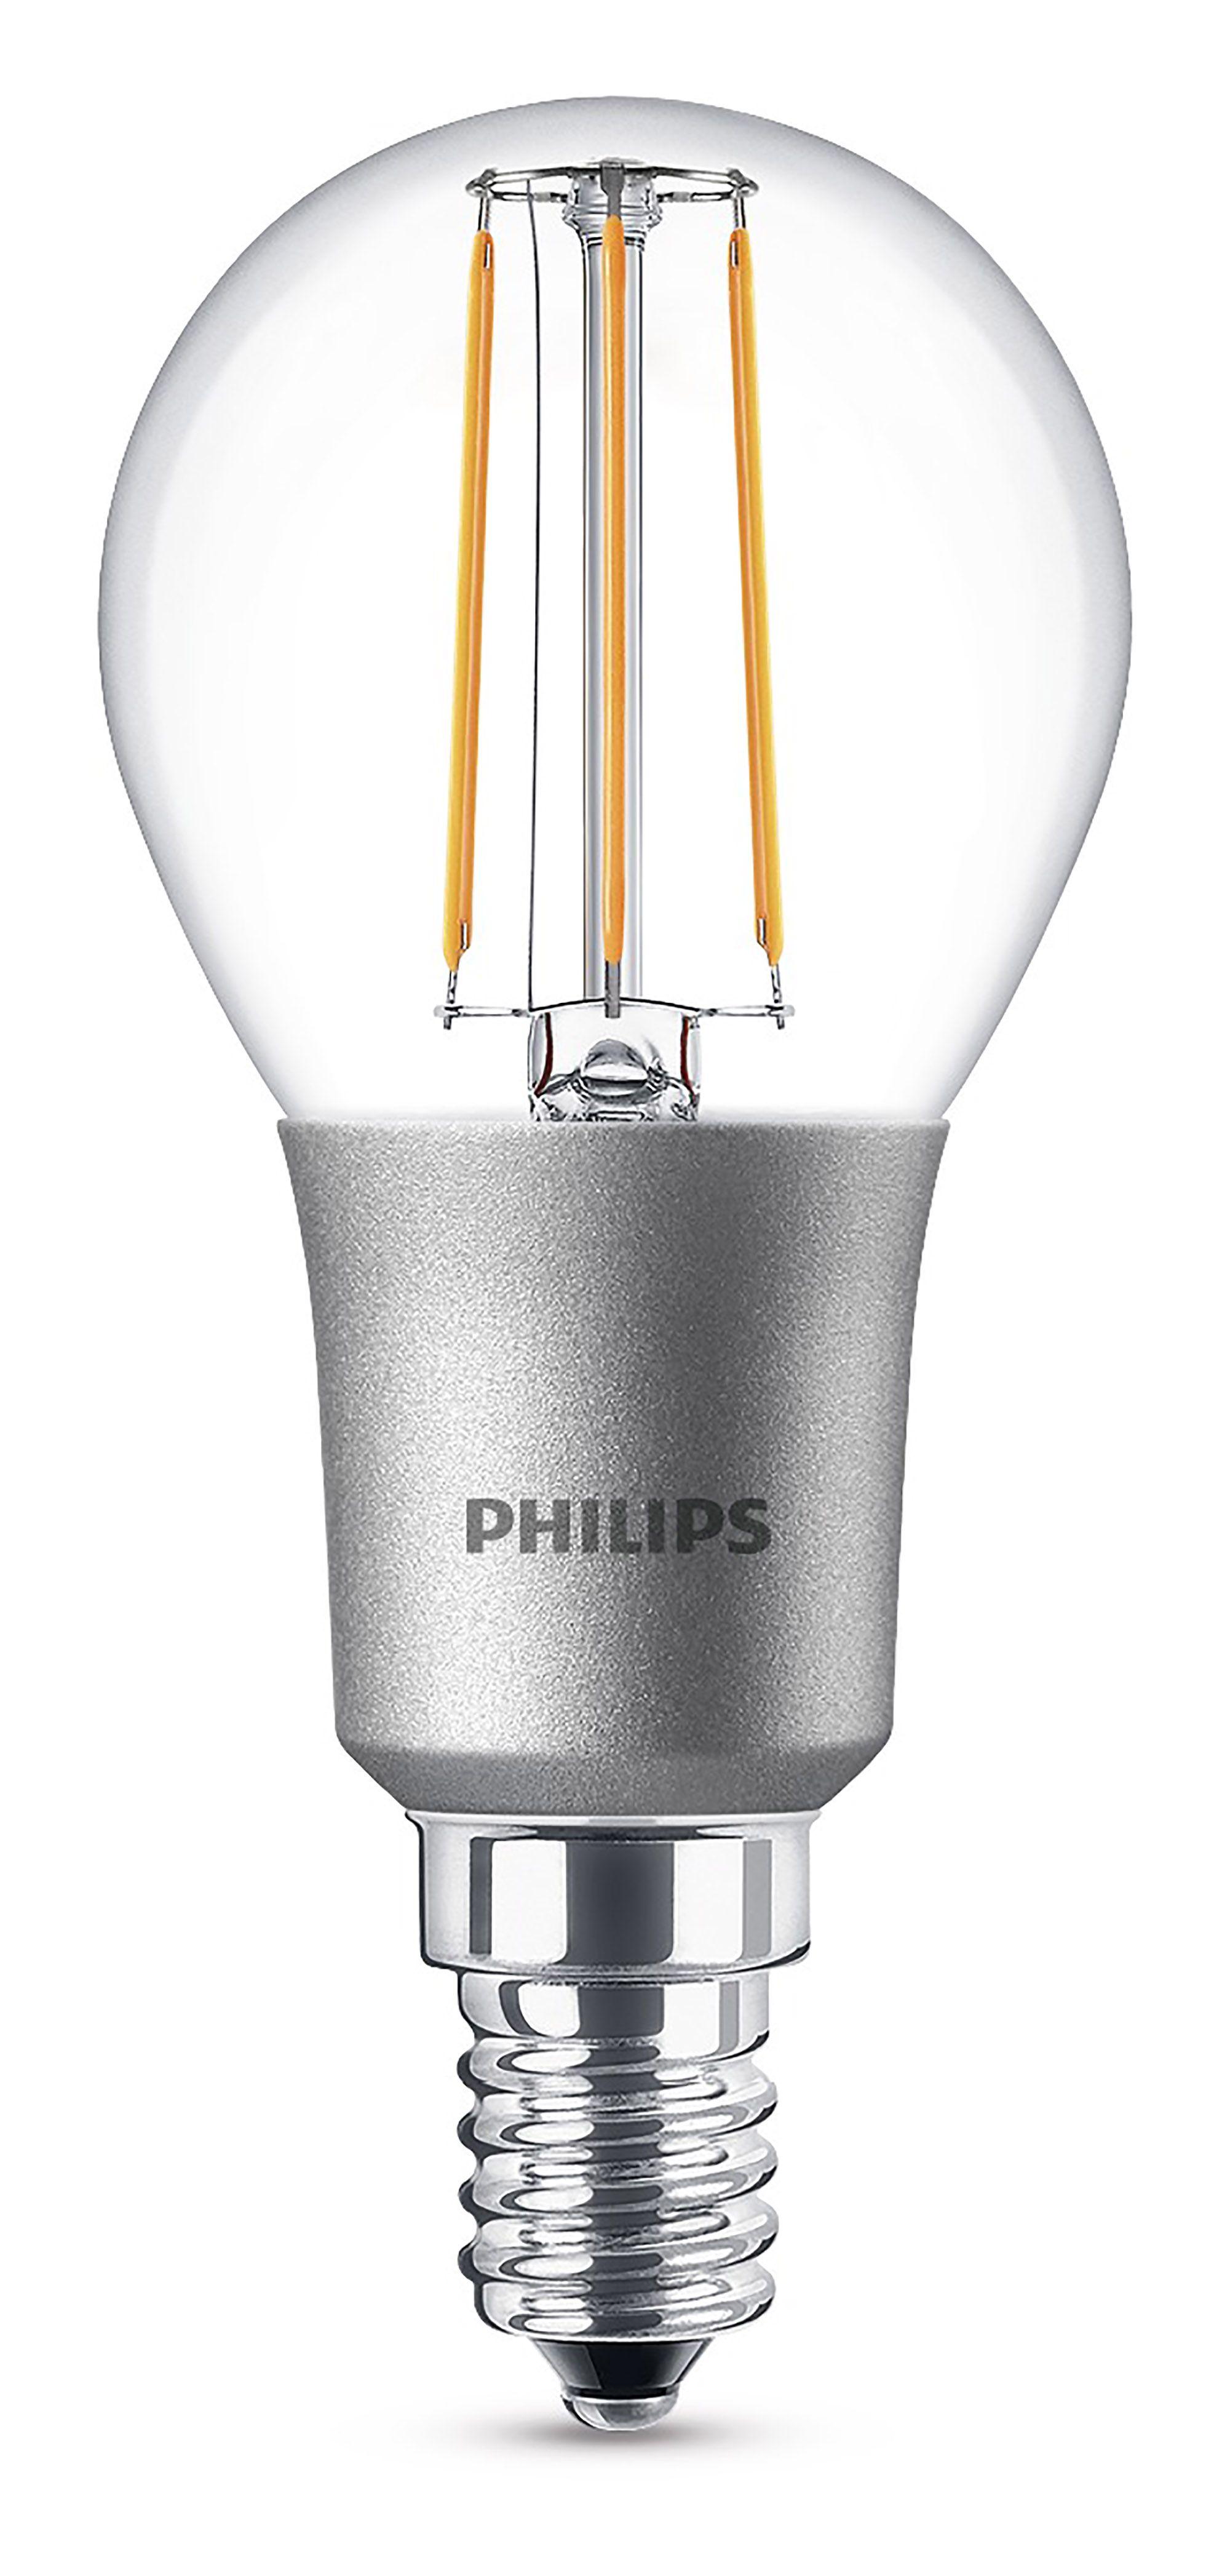 Philips E14 470lm Led Dimmable Mini Globe Light Bulb